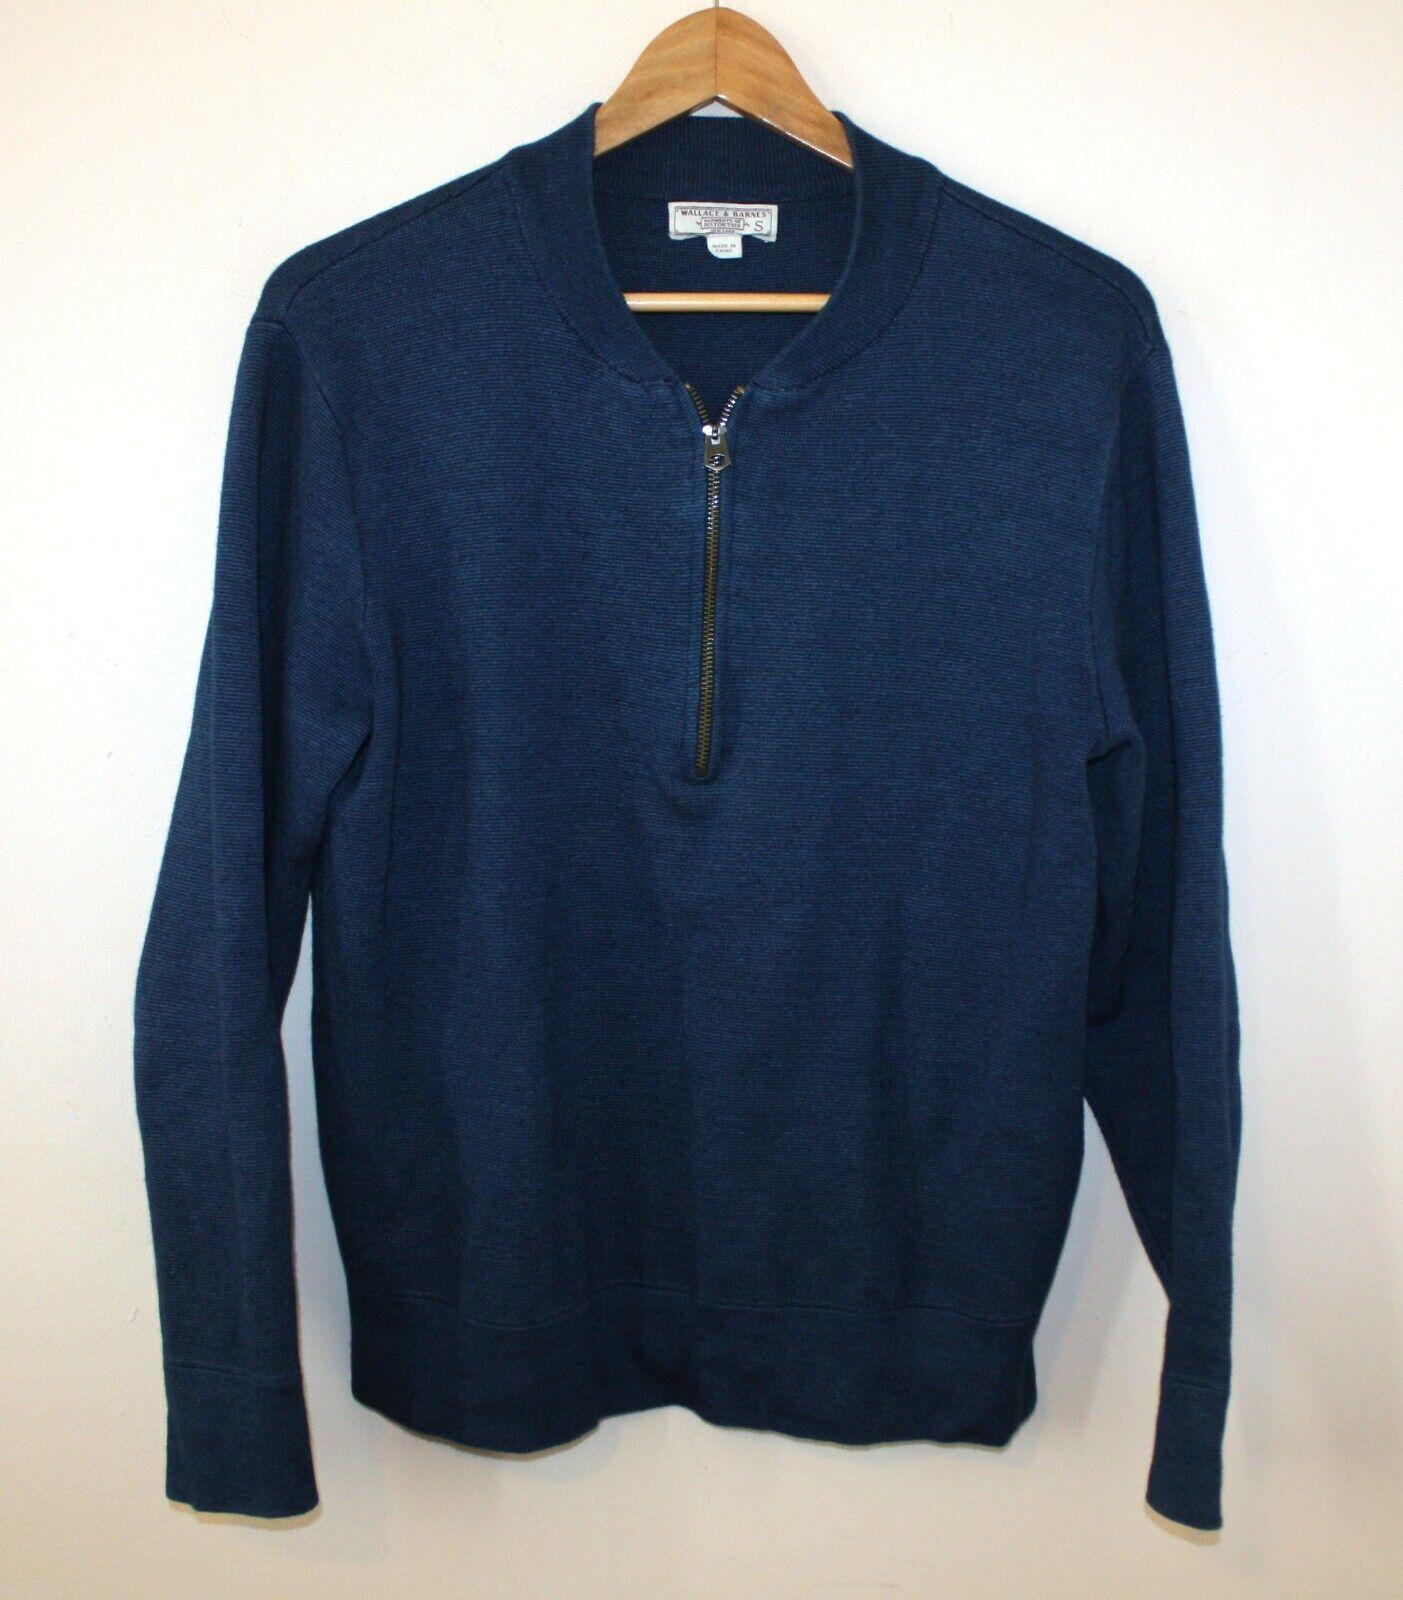 Wallace And Barnes Half-Zip Indigo Sweater bluee Cotton Men's Small